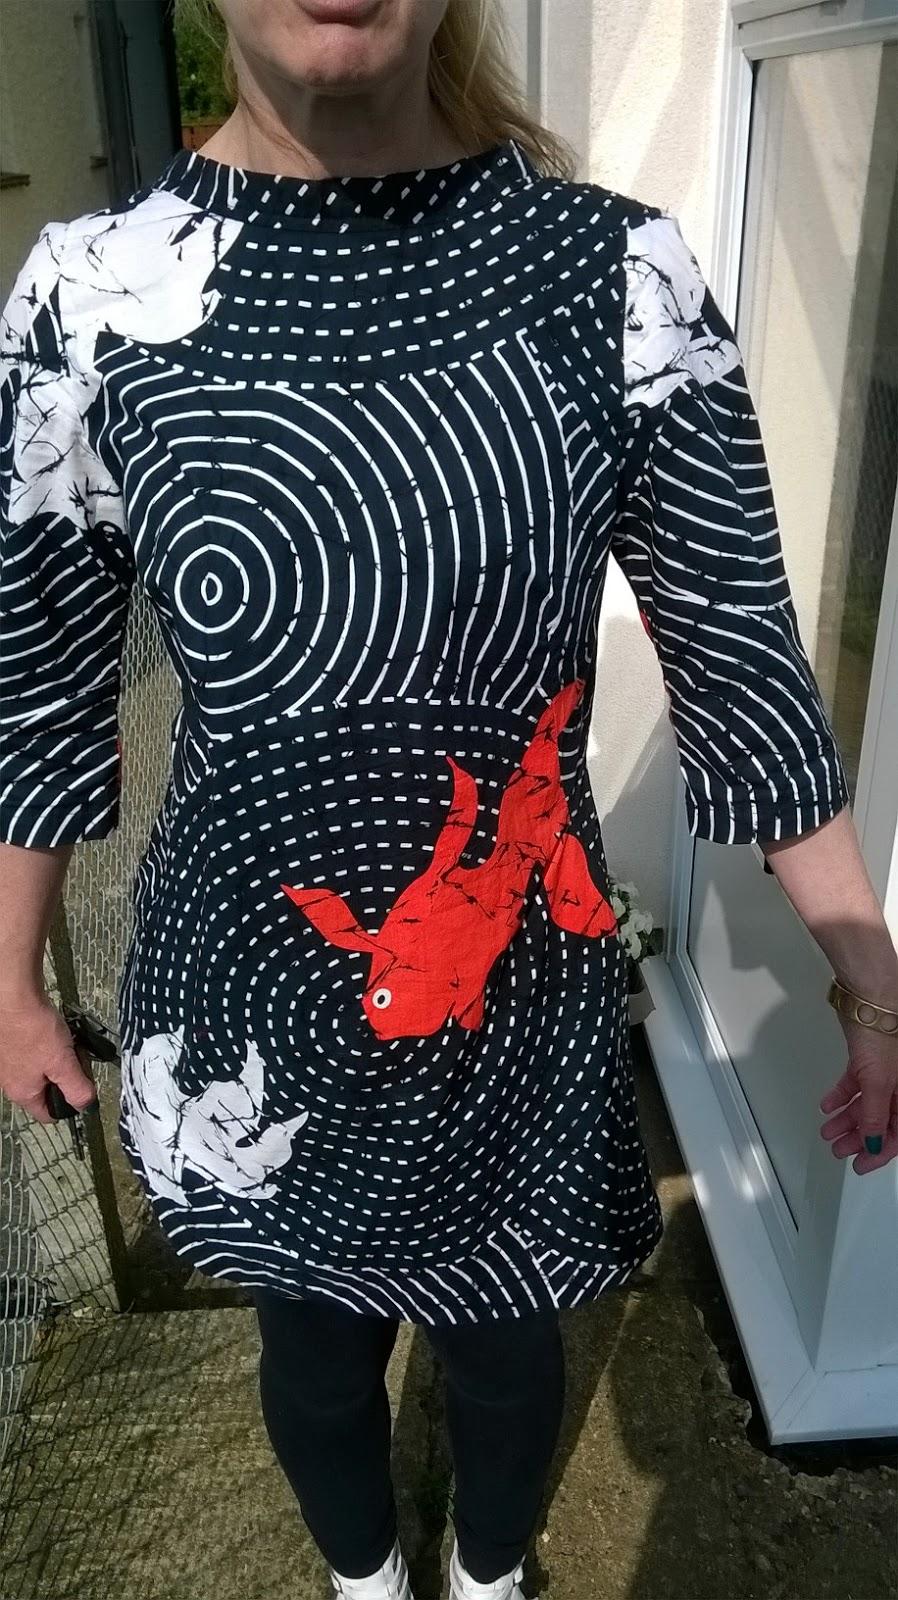 https://brackencrafts.blogspot.com/2016/05/45-goldfish-dress-mmmay16-day-27_27.html